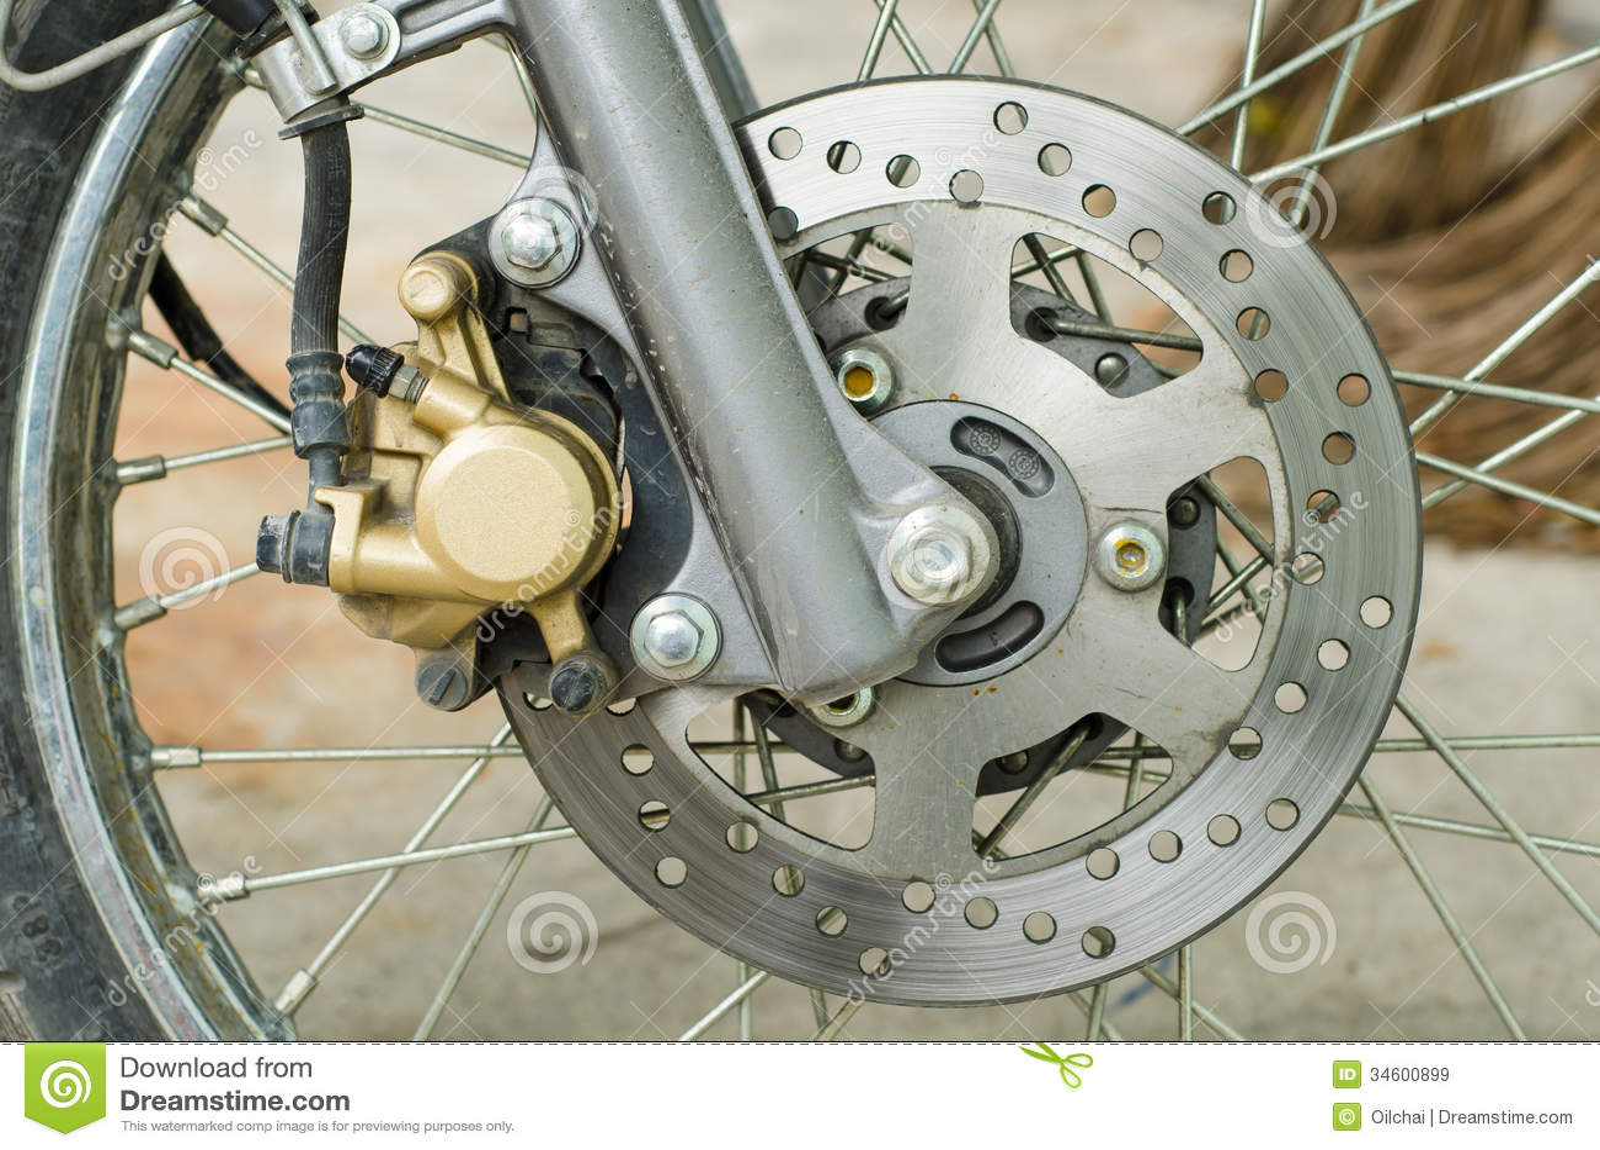 Disc Brake Part Stock Image Image Of Disc Bike Disc 34600899